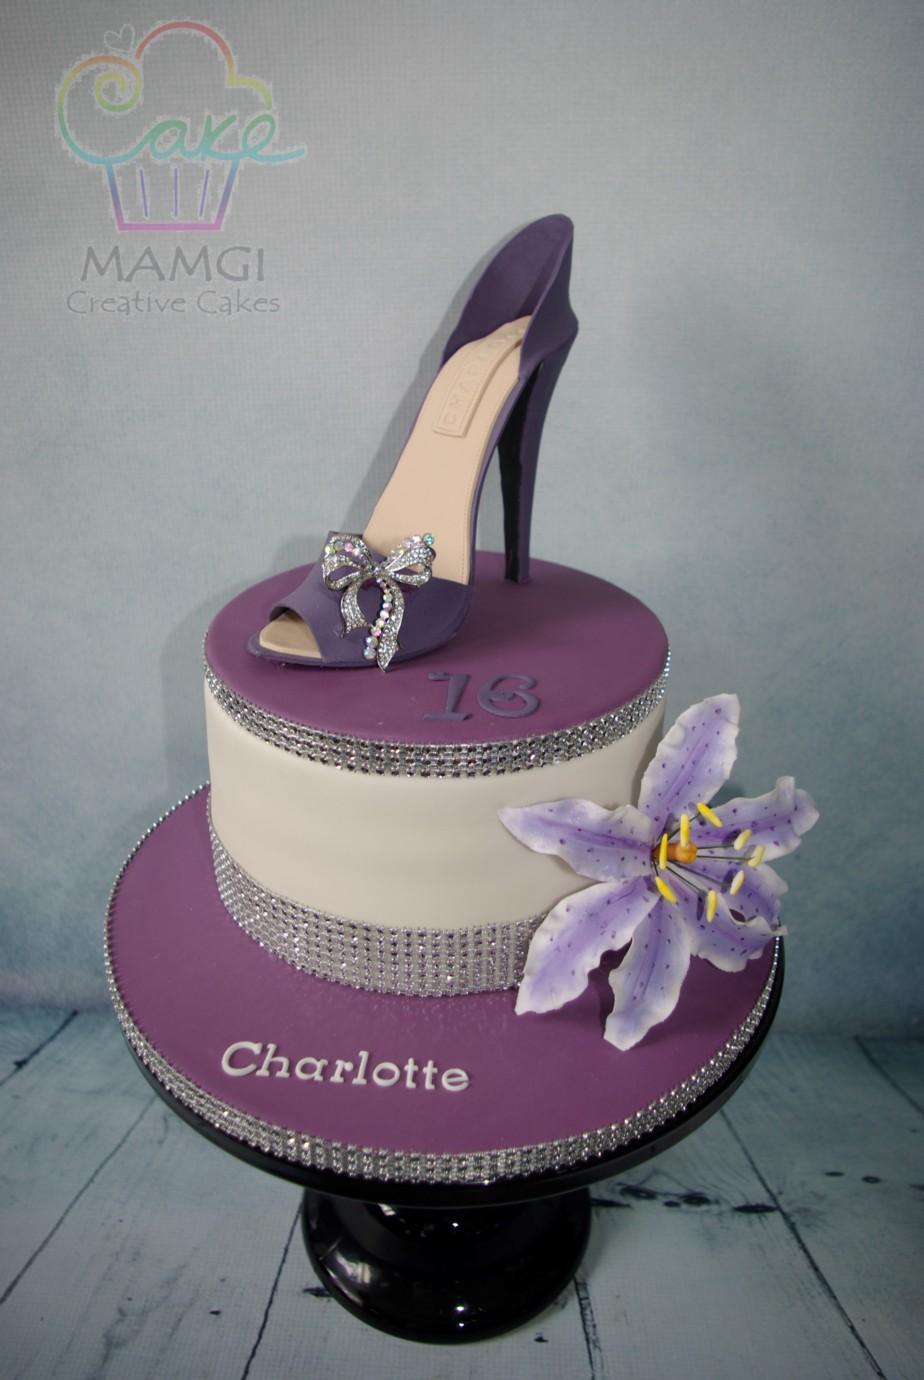 mamgi cakes